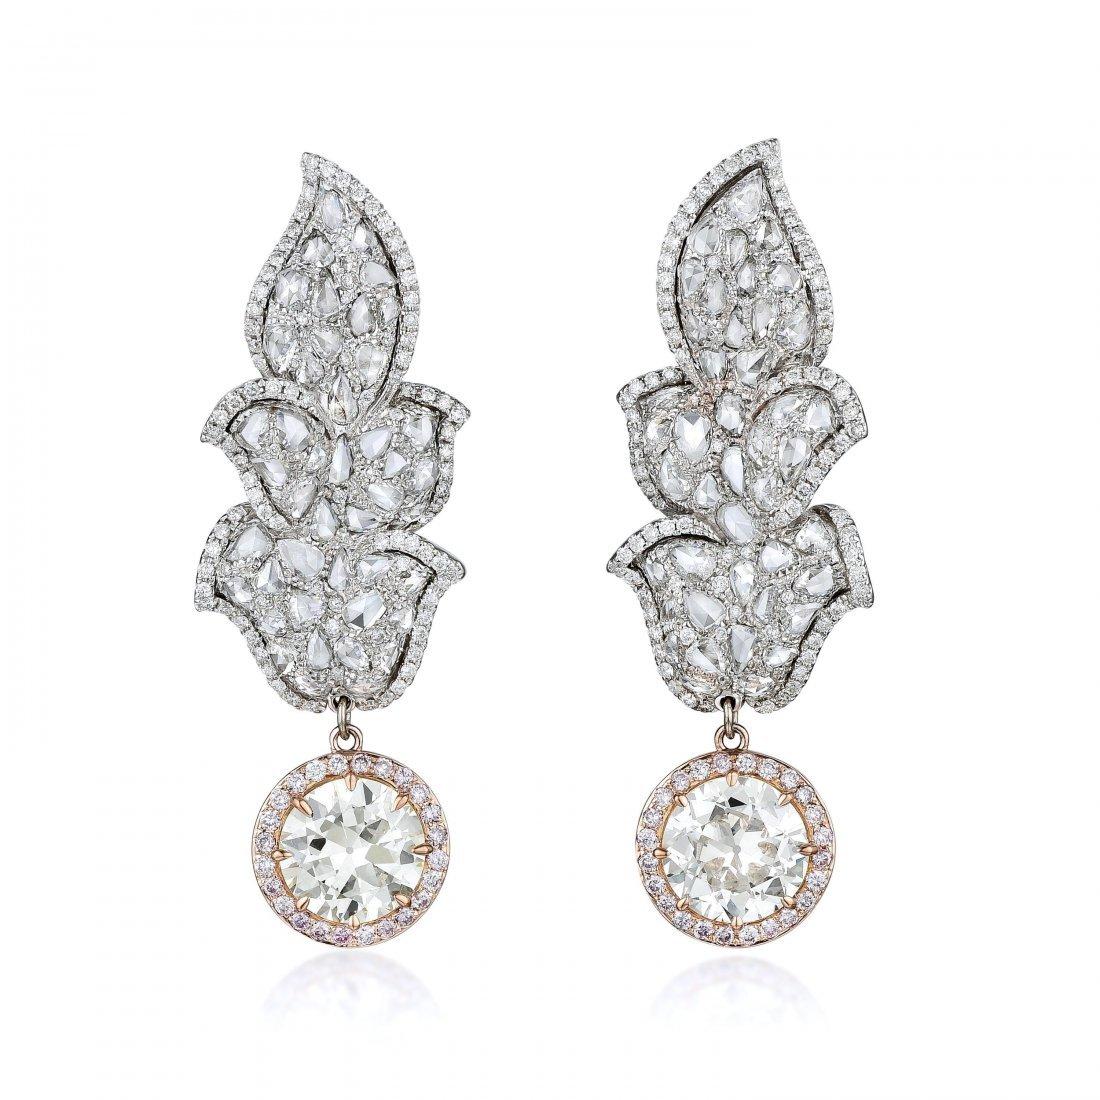 A Pair of Old European-Cut Diamond Earrings - 2